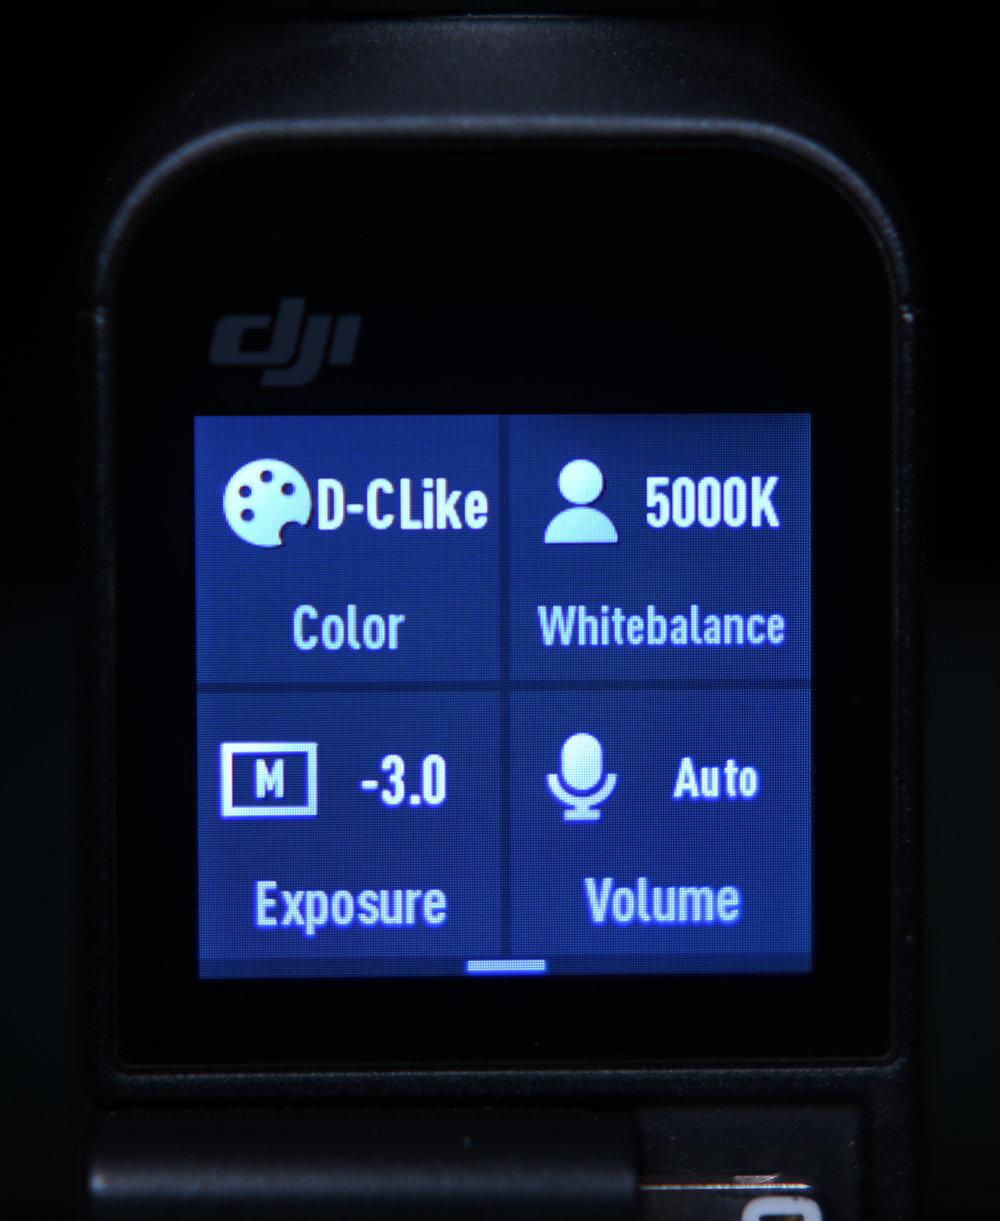 dji_osmo_pocket_camera_4k_video_dji_camera_features_hindi